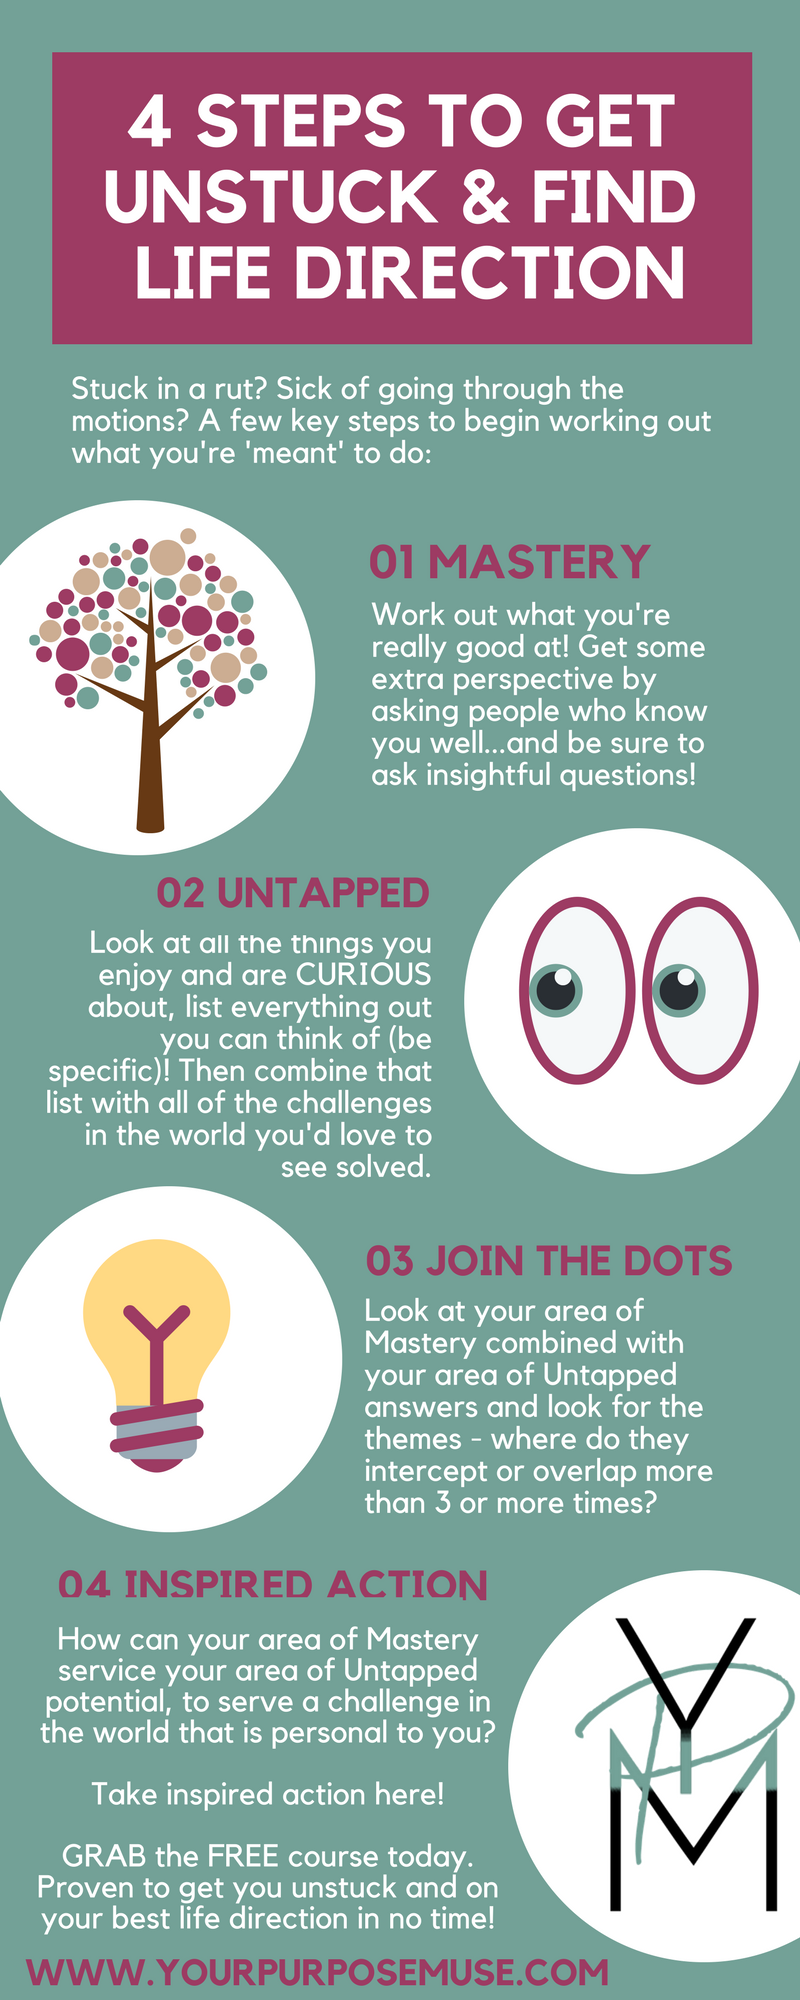 4 Steps To Get Unstuck Find Your Life Direction Pinterest